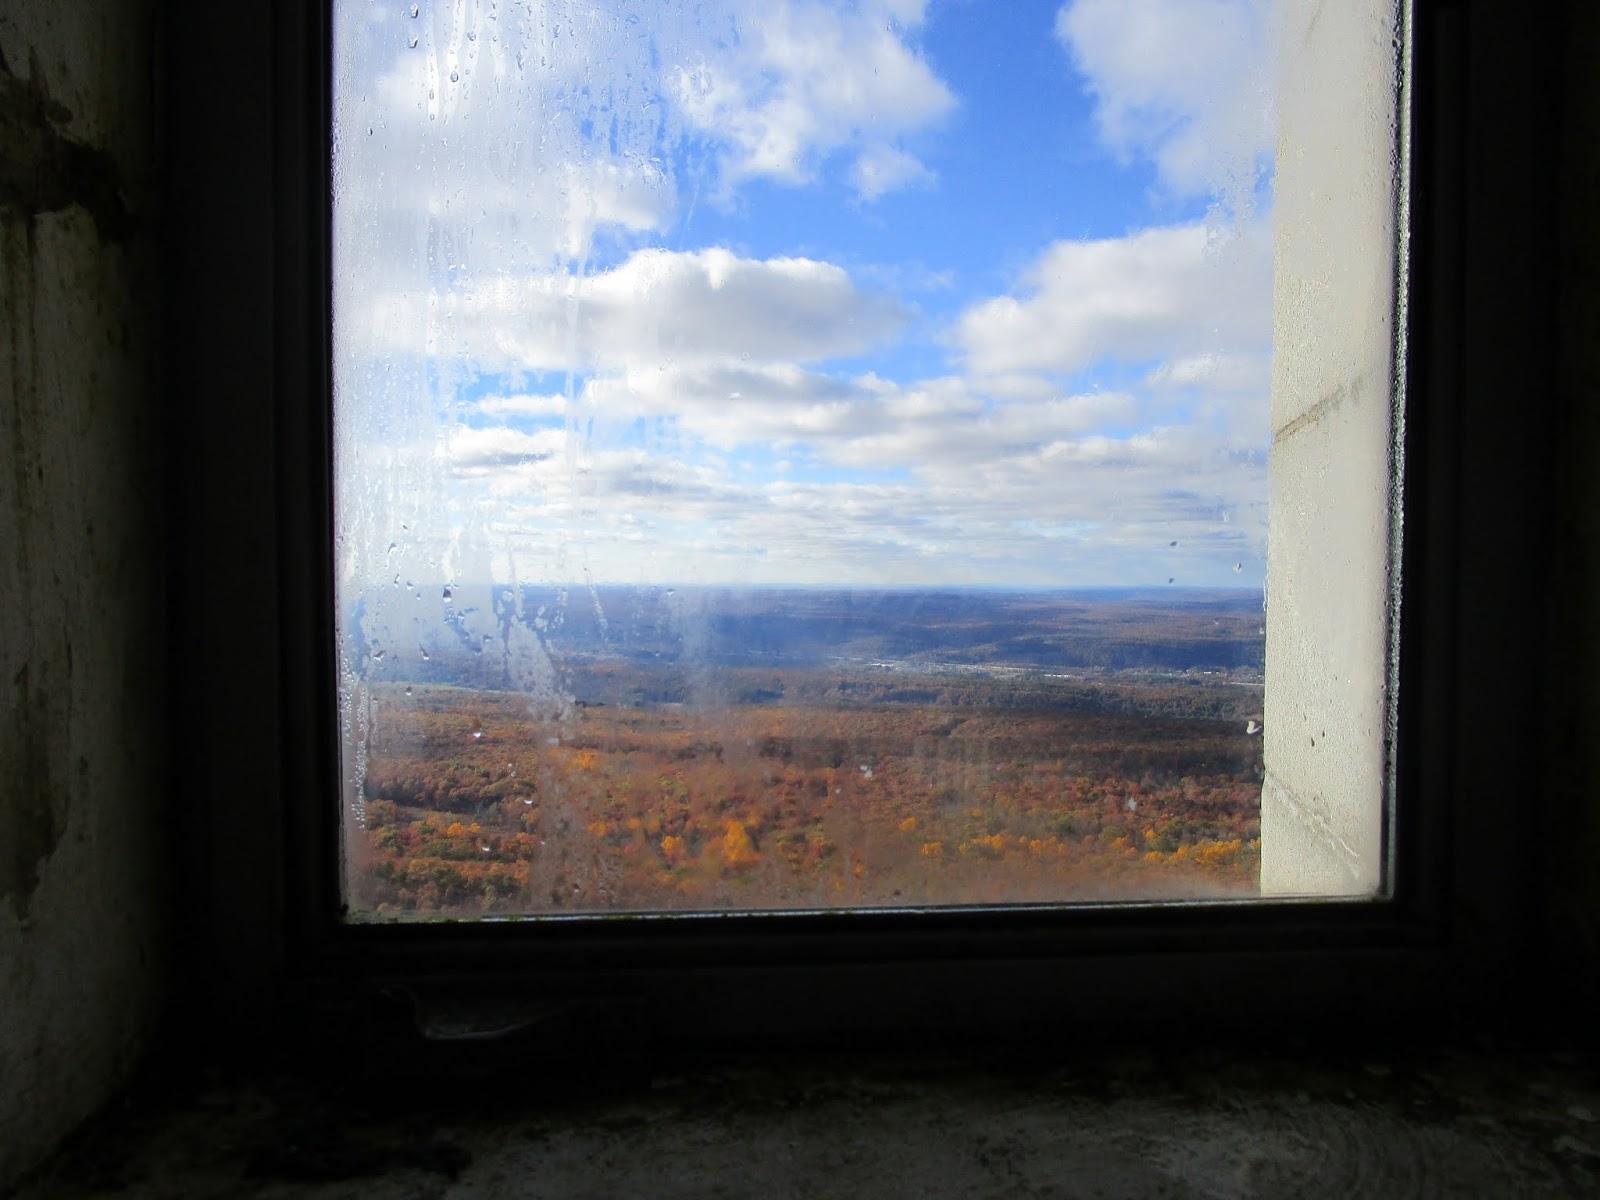 Парк Хай Поинт - самая высокая точка Нью-Джерси (High Point State Park, NJ)